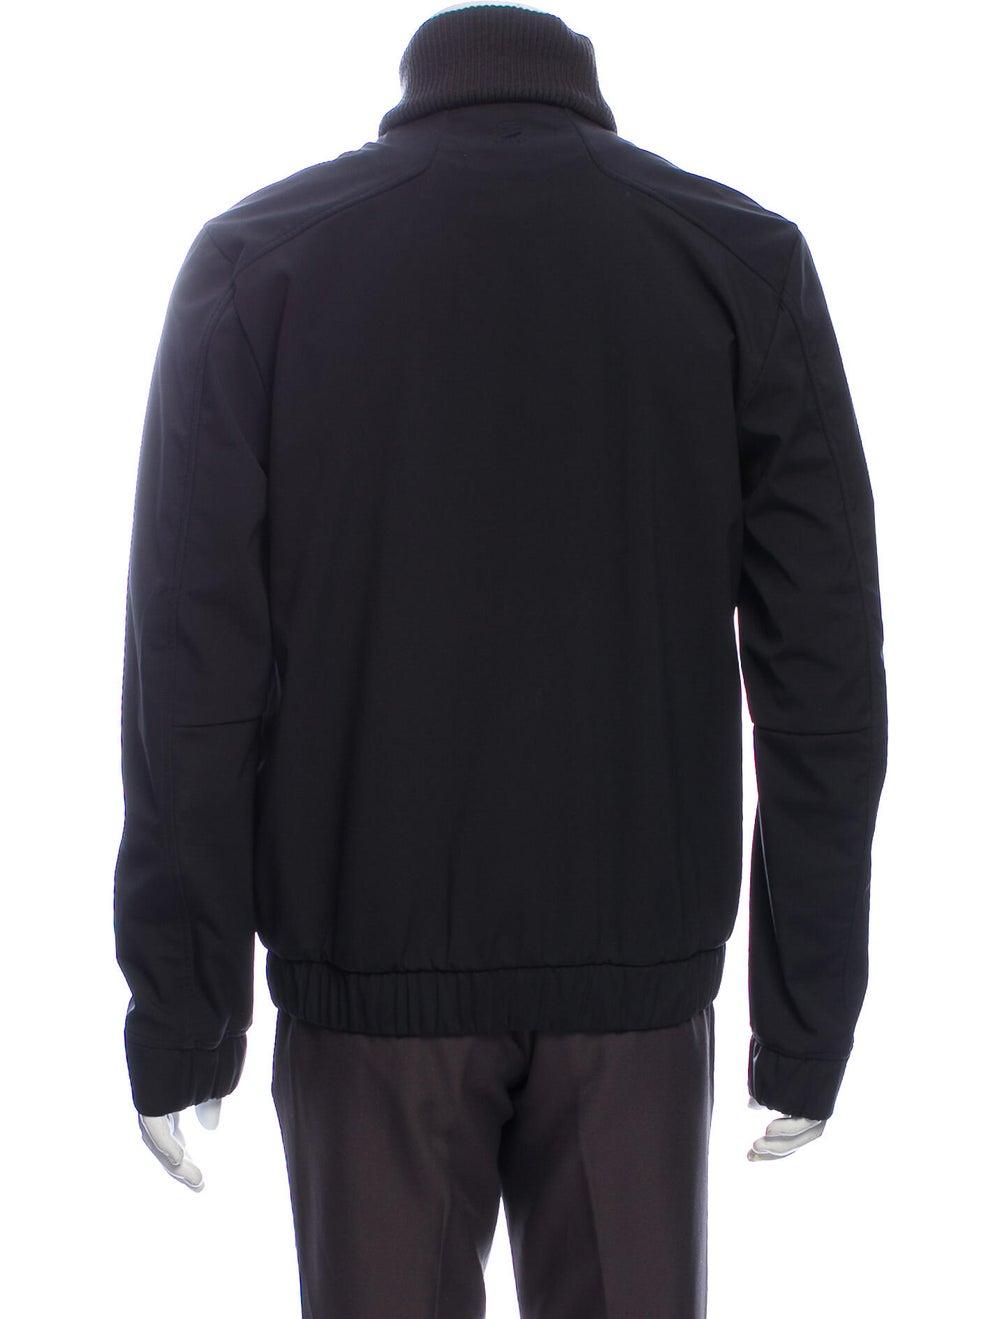 Porsche Design Jacket Black - image 3